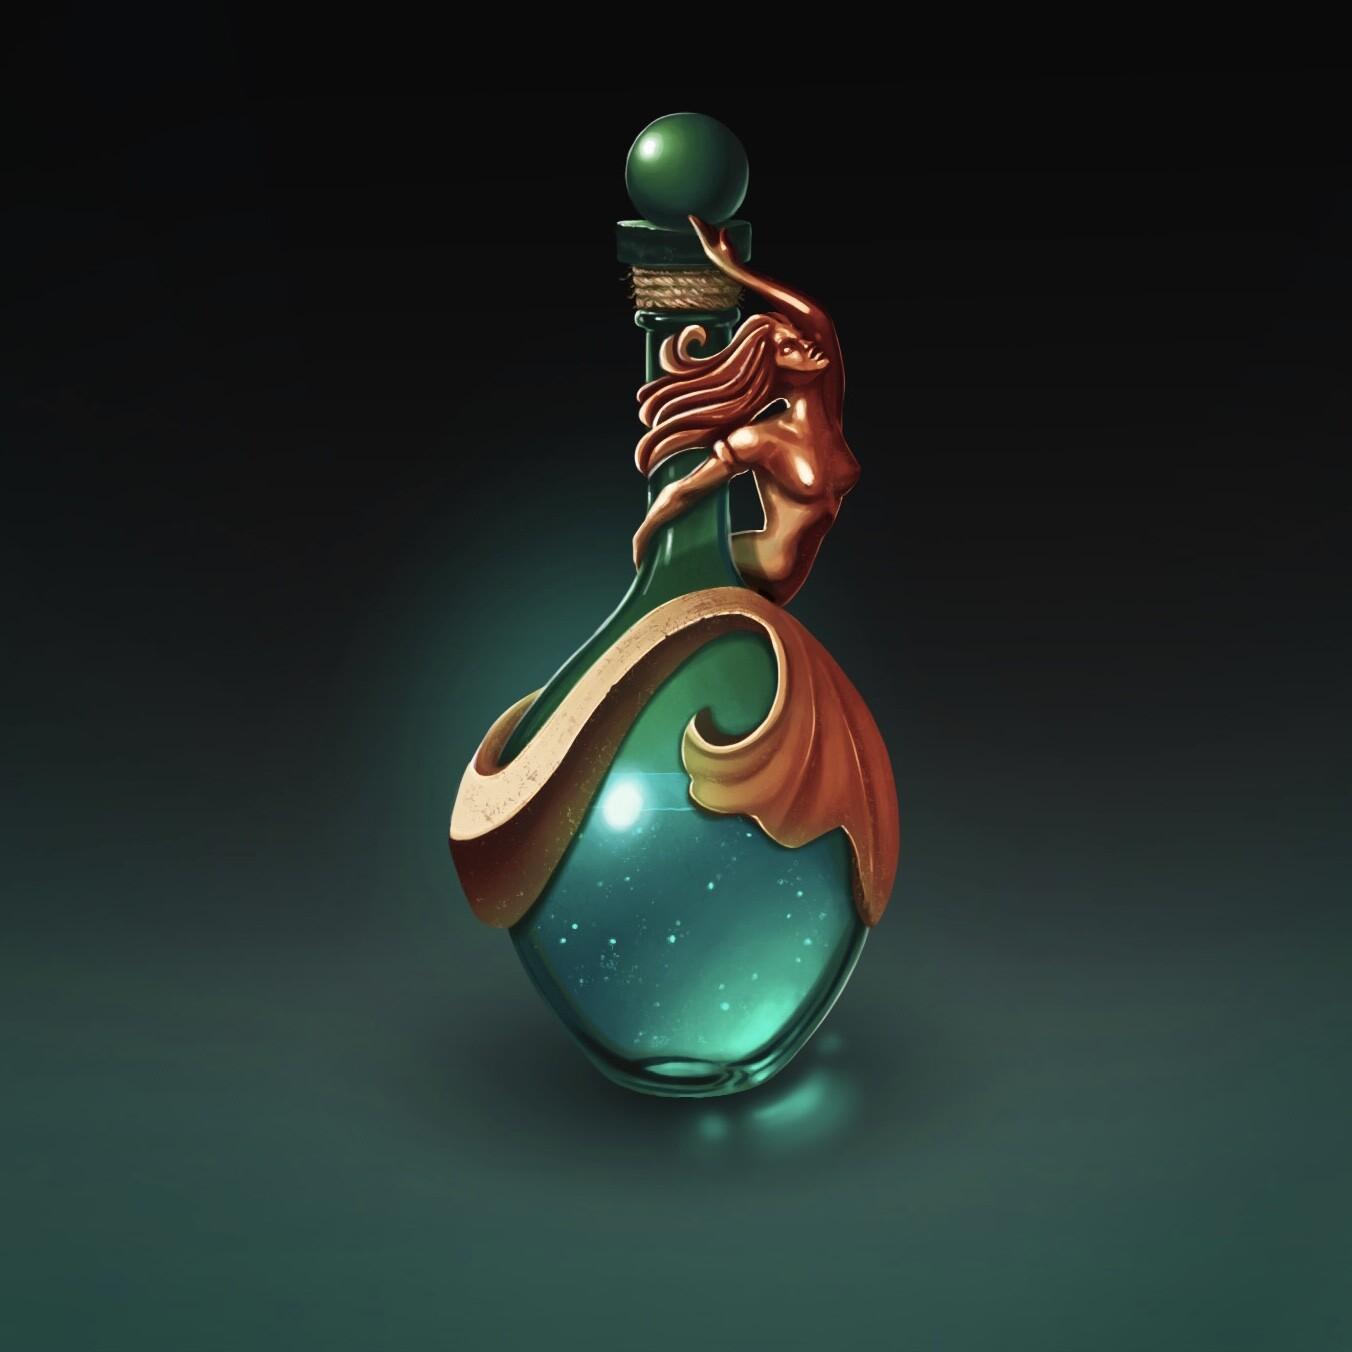 Mermaid Gills